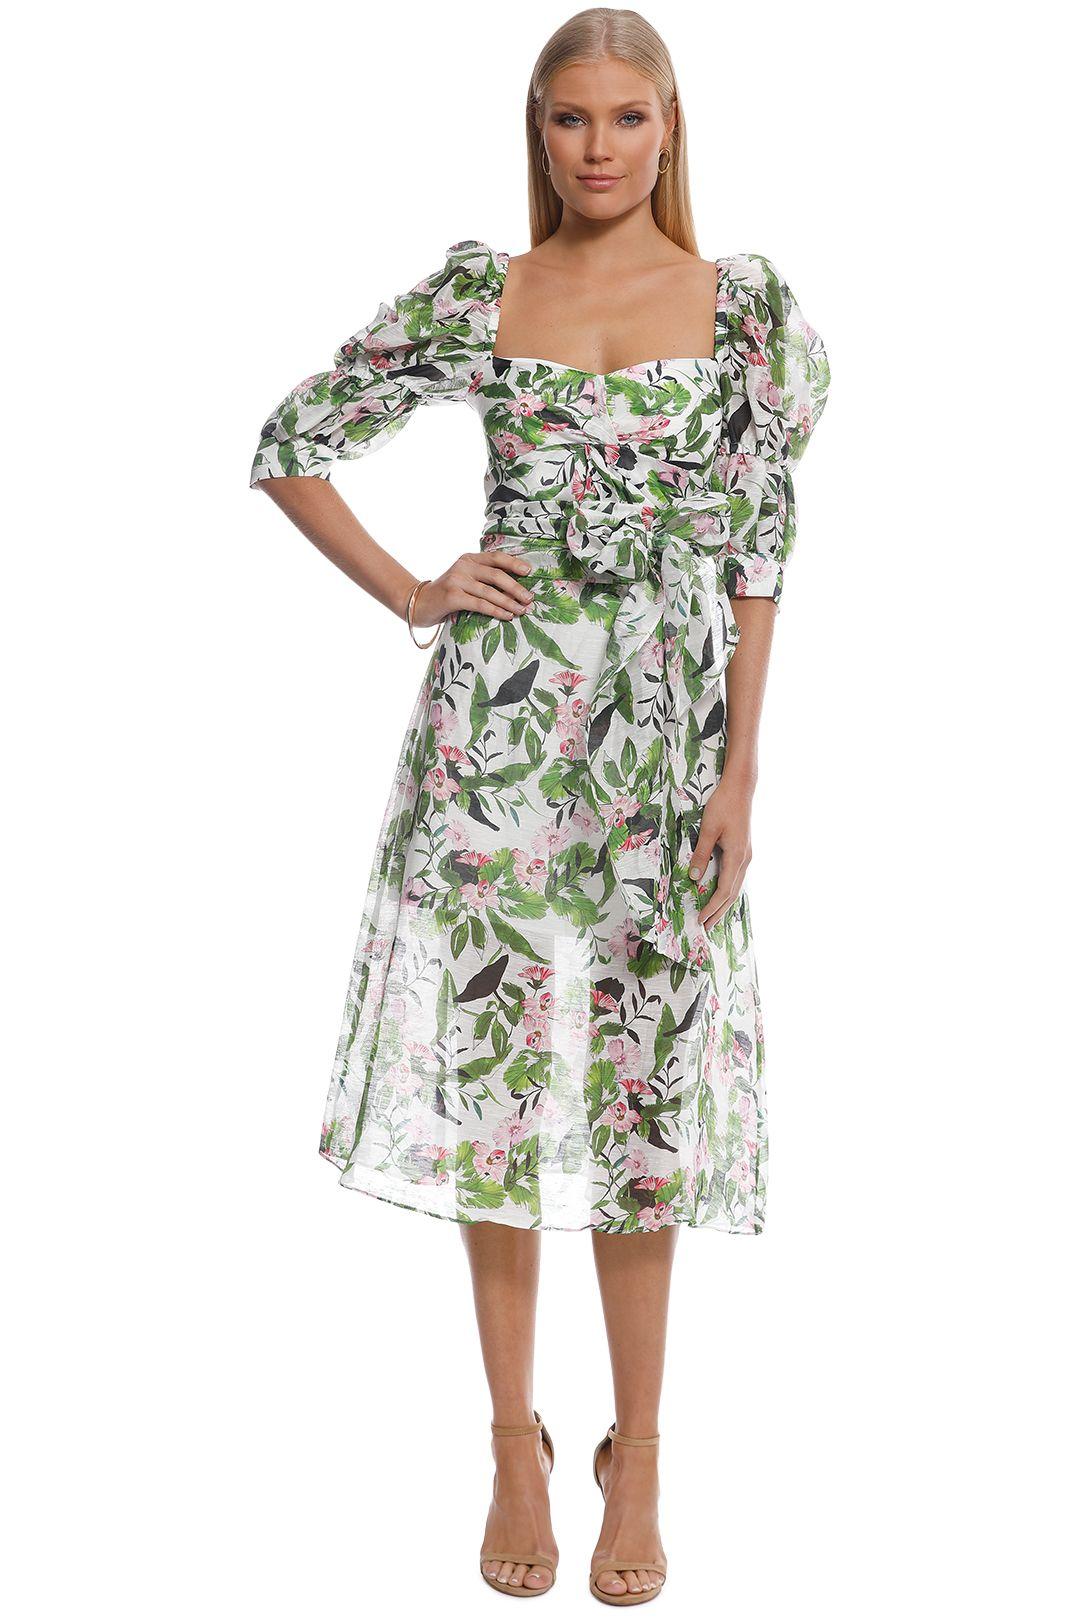 Talulah - Tropo Dreams Midi Dress - Tropical Bloom - Front